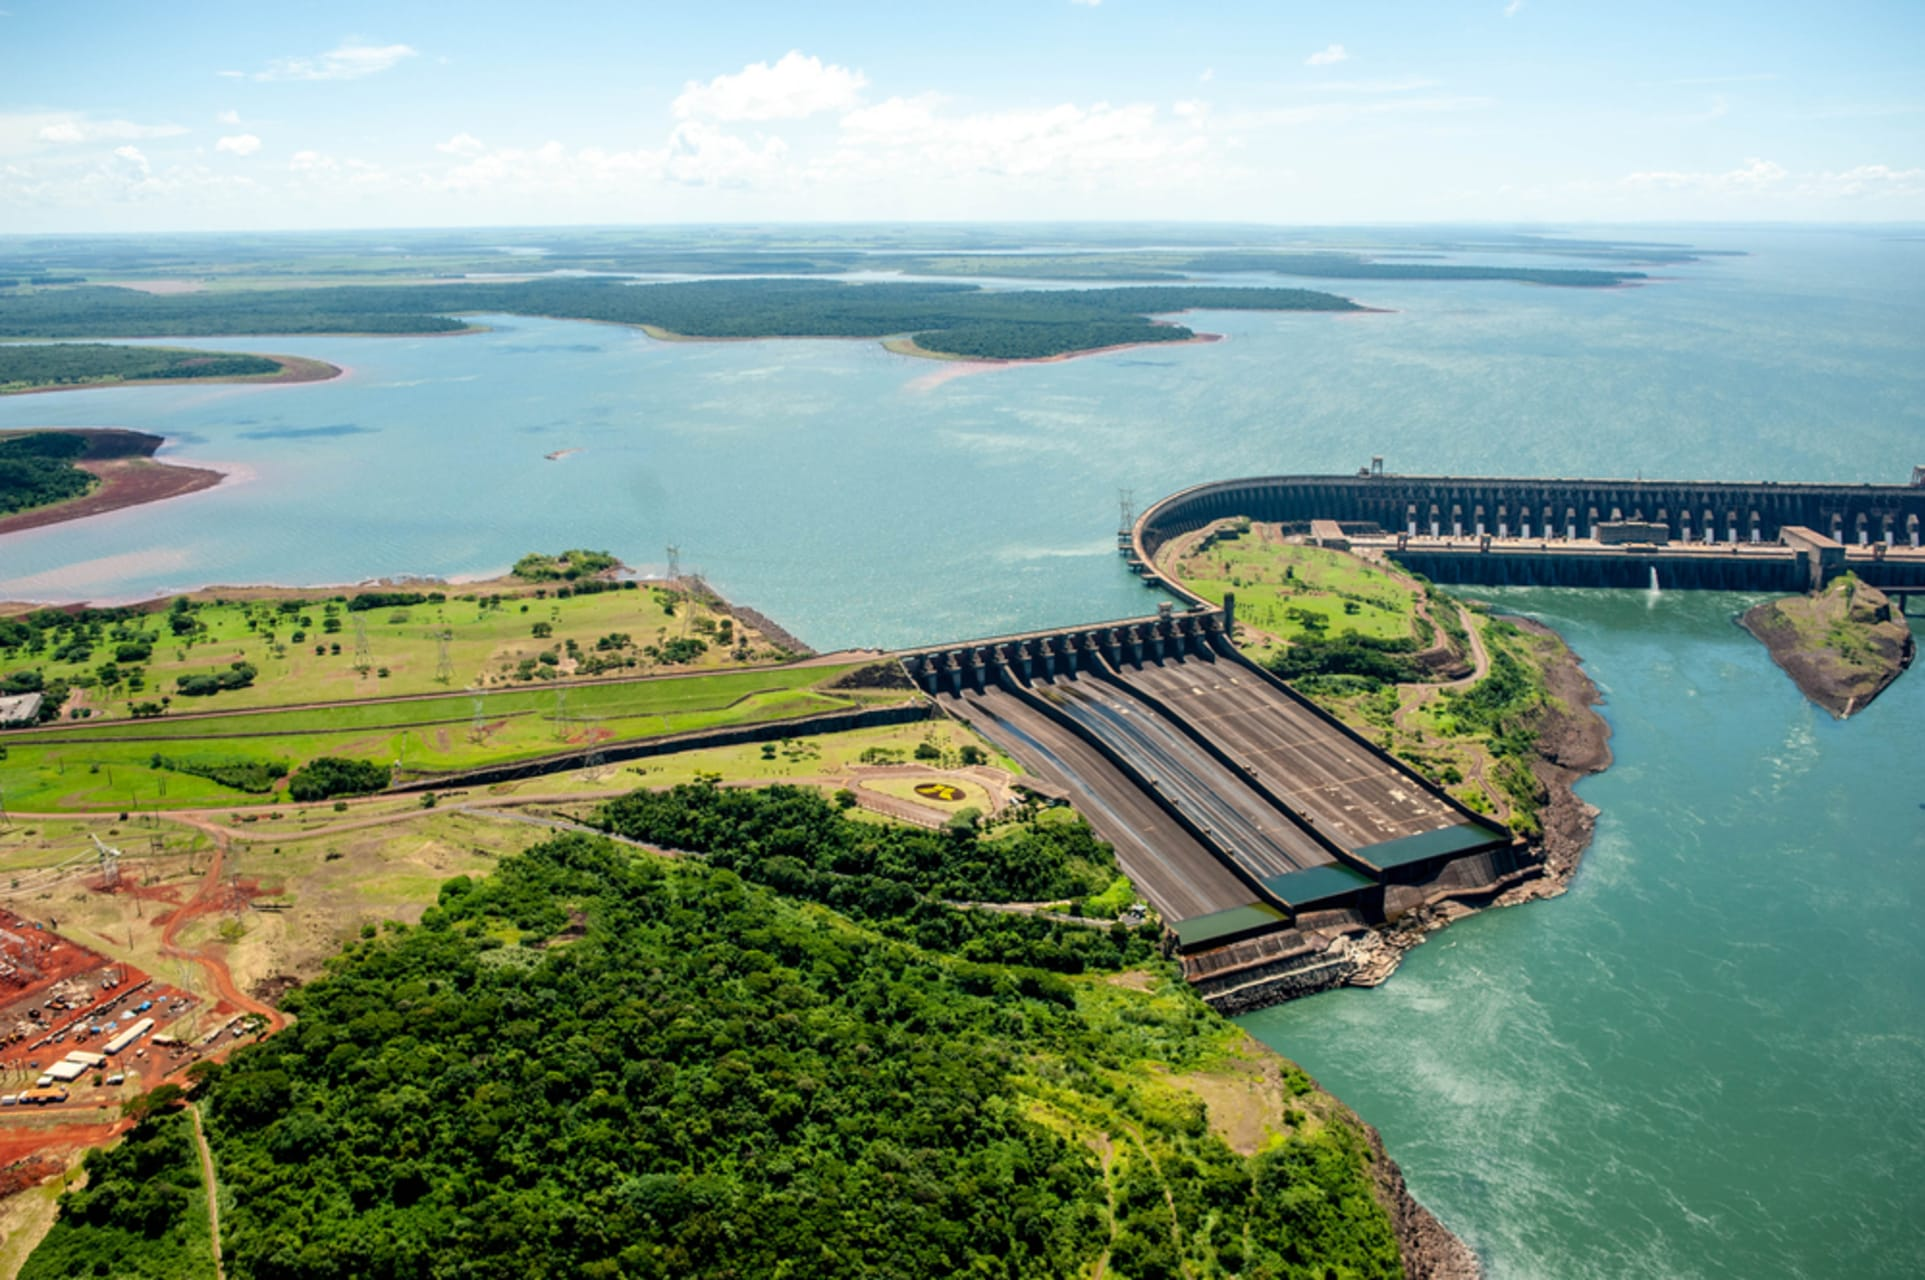 Iguazu Falls - Itaipu Dam - One of the Modern Wonders of the World